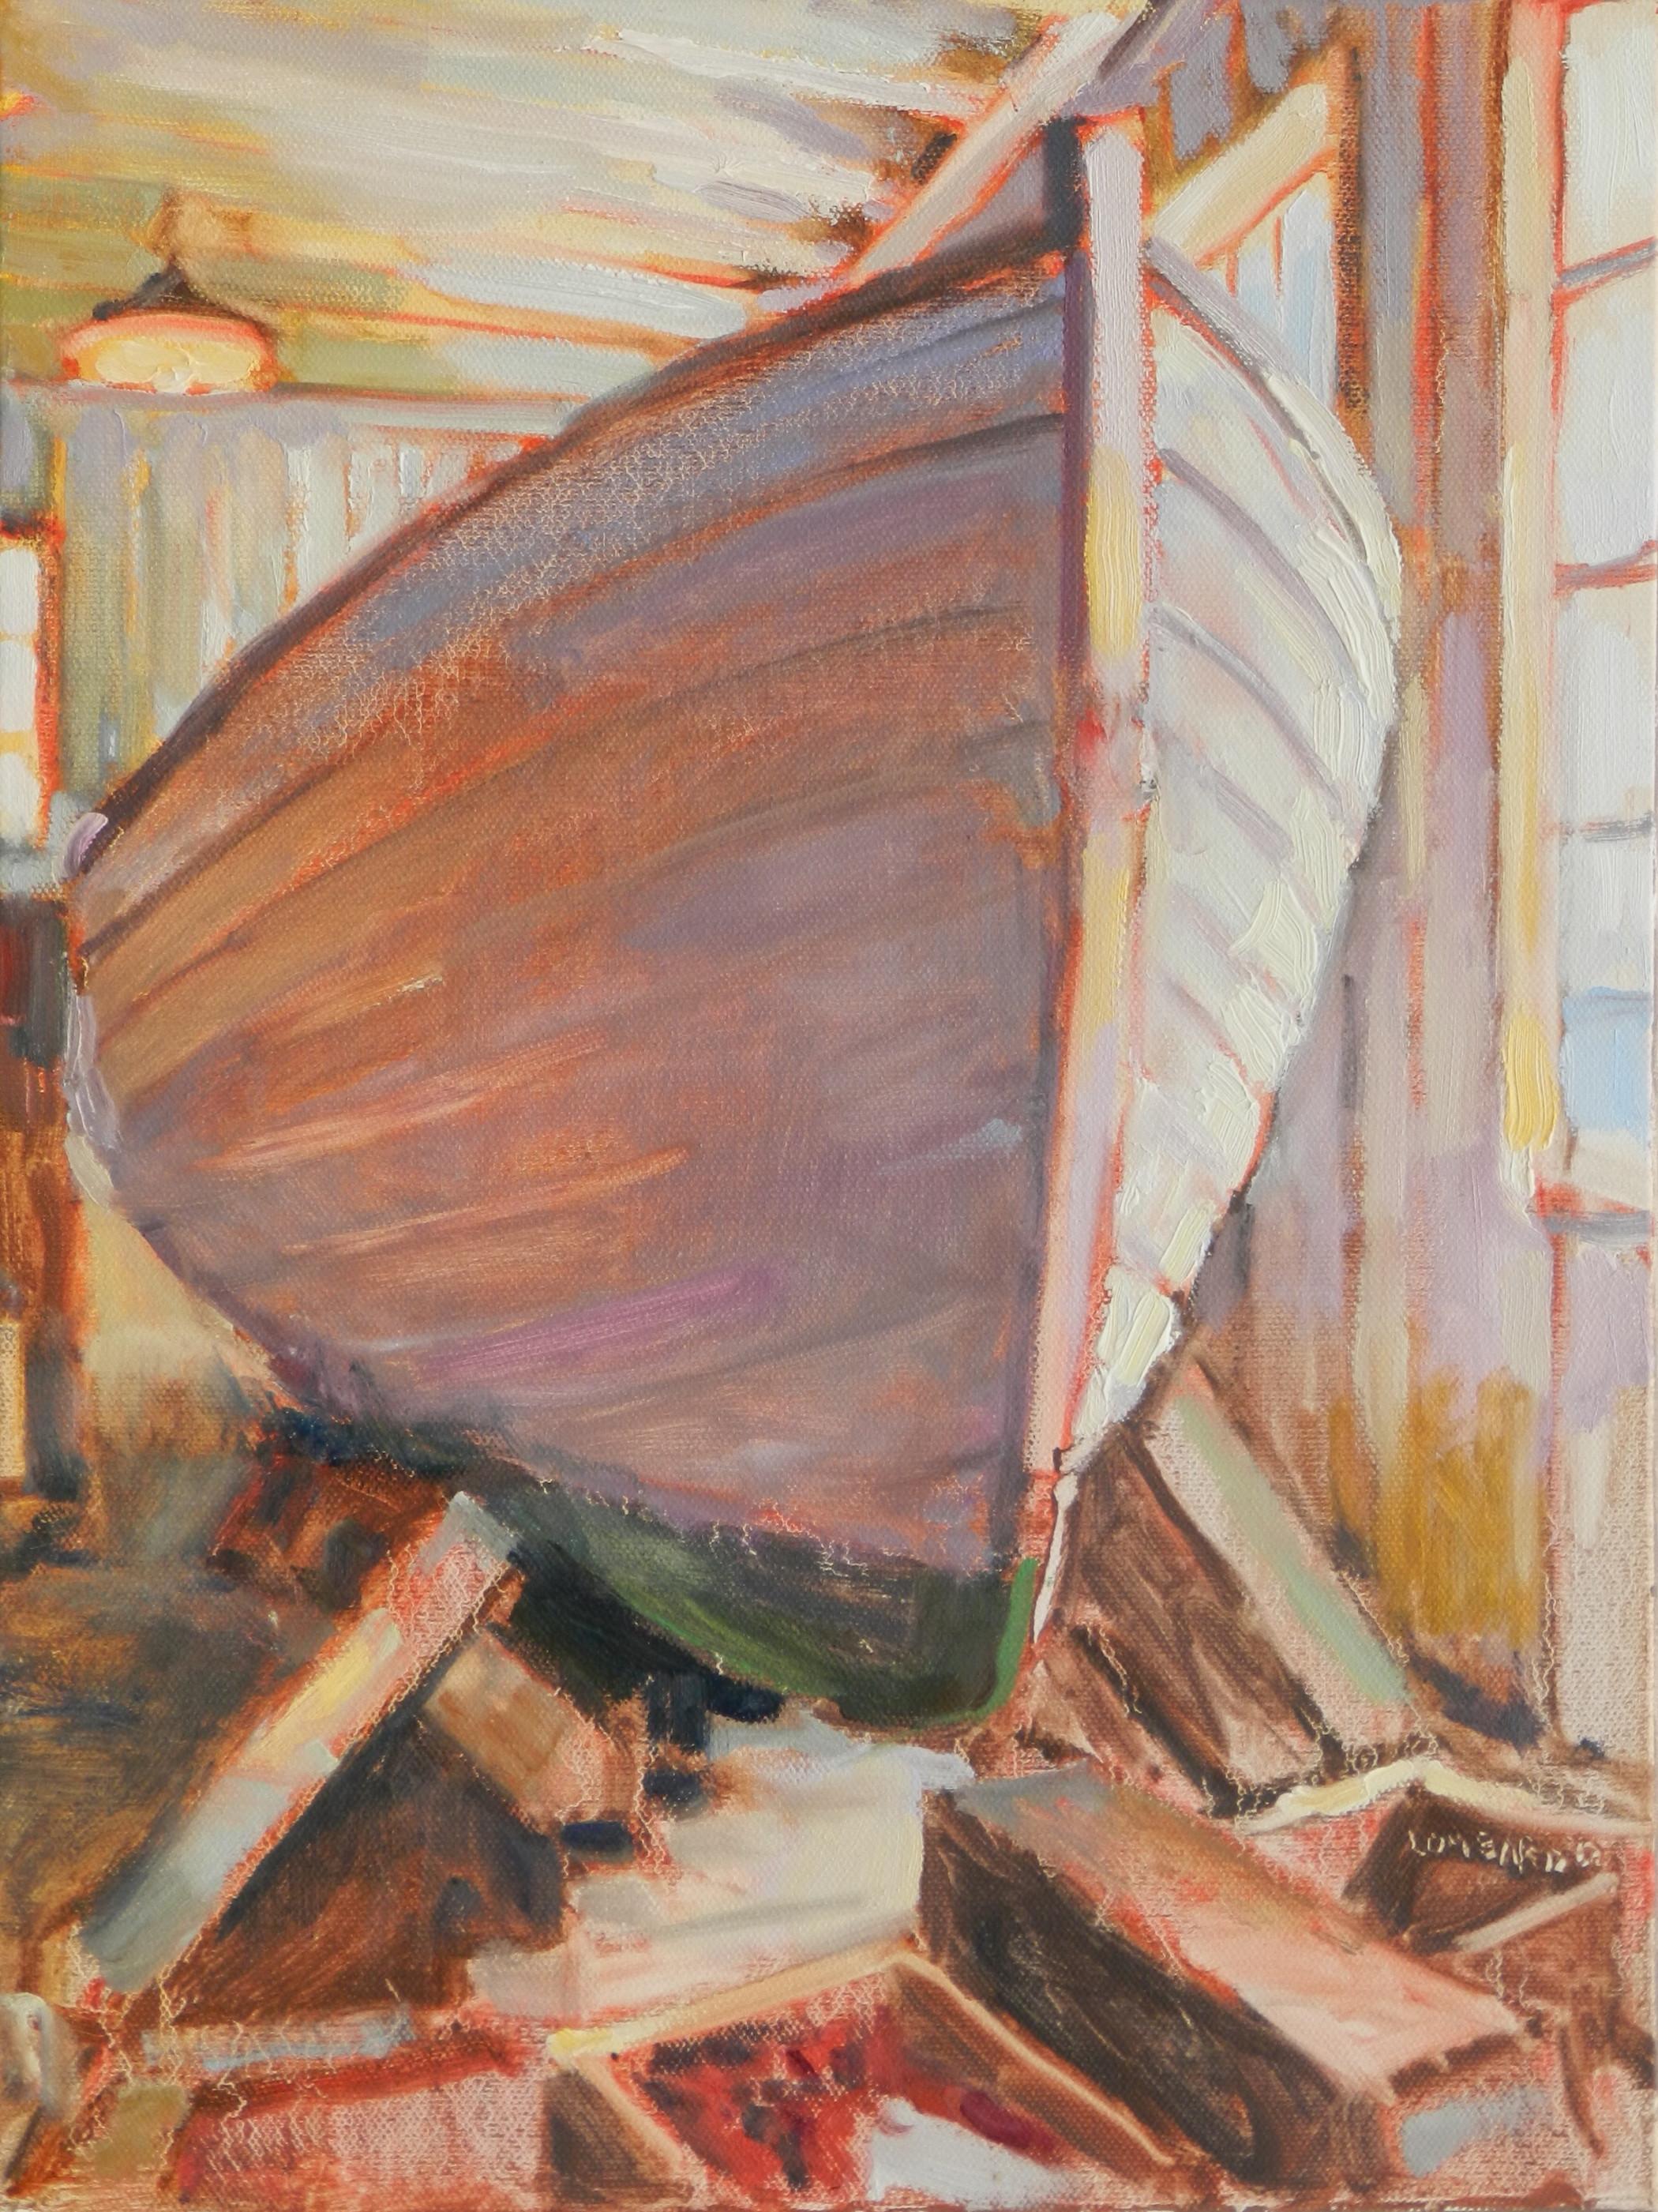 Joseph Lombardo, Canning, 16x12, oil